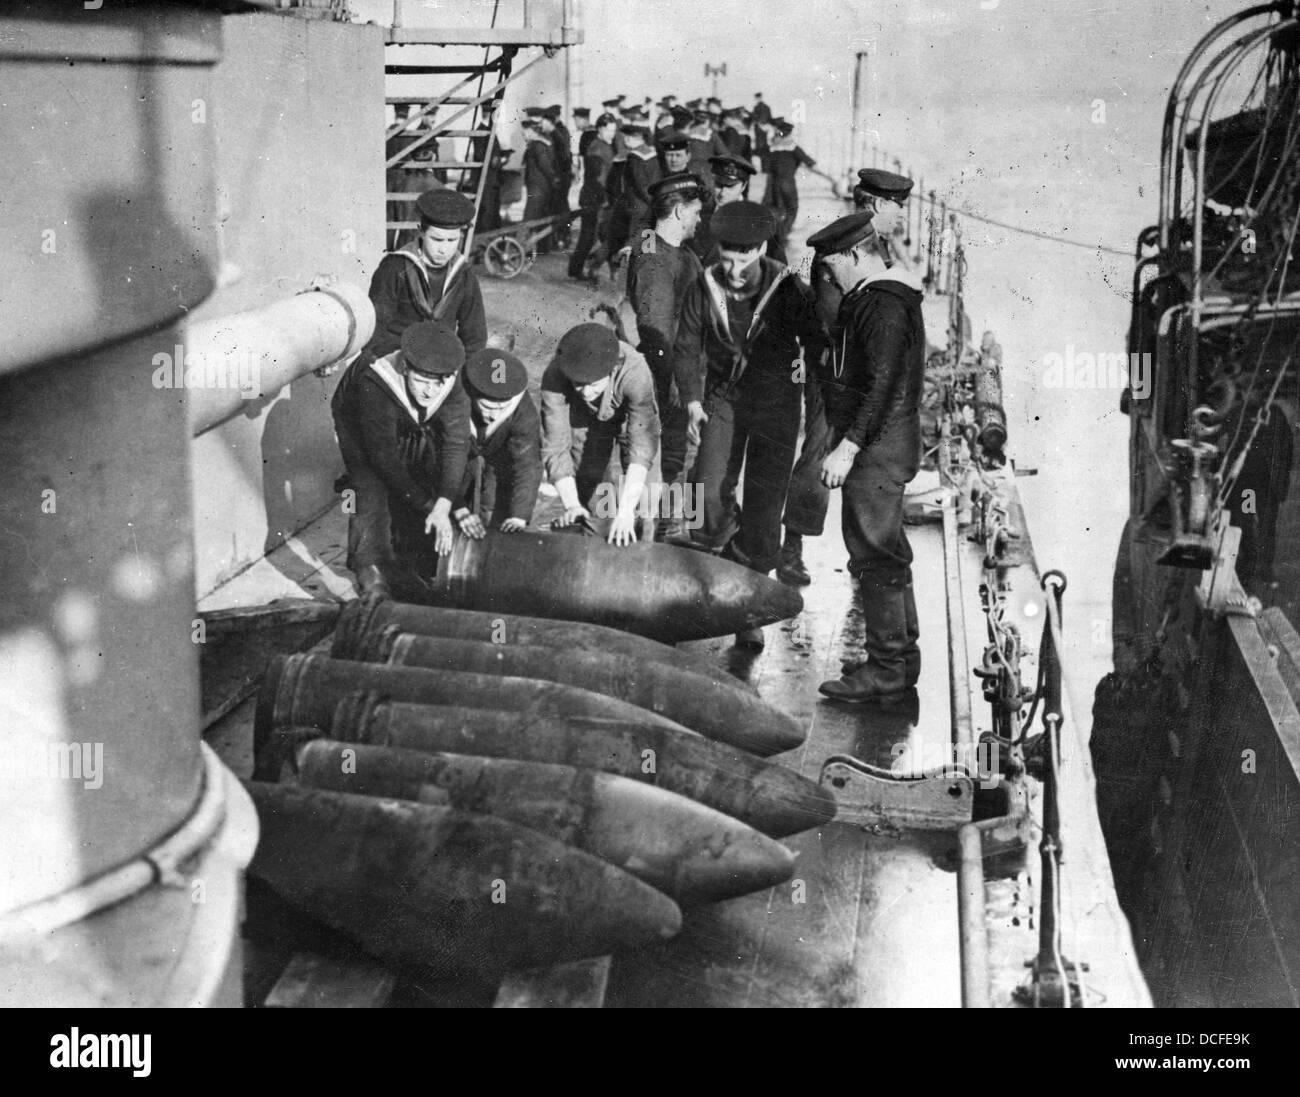 Great War Ww1 Royal Navy Sailors Prepare Shells On A Battleship Stock Photo Royalty Free Image